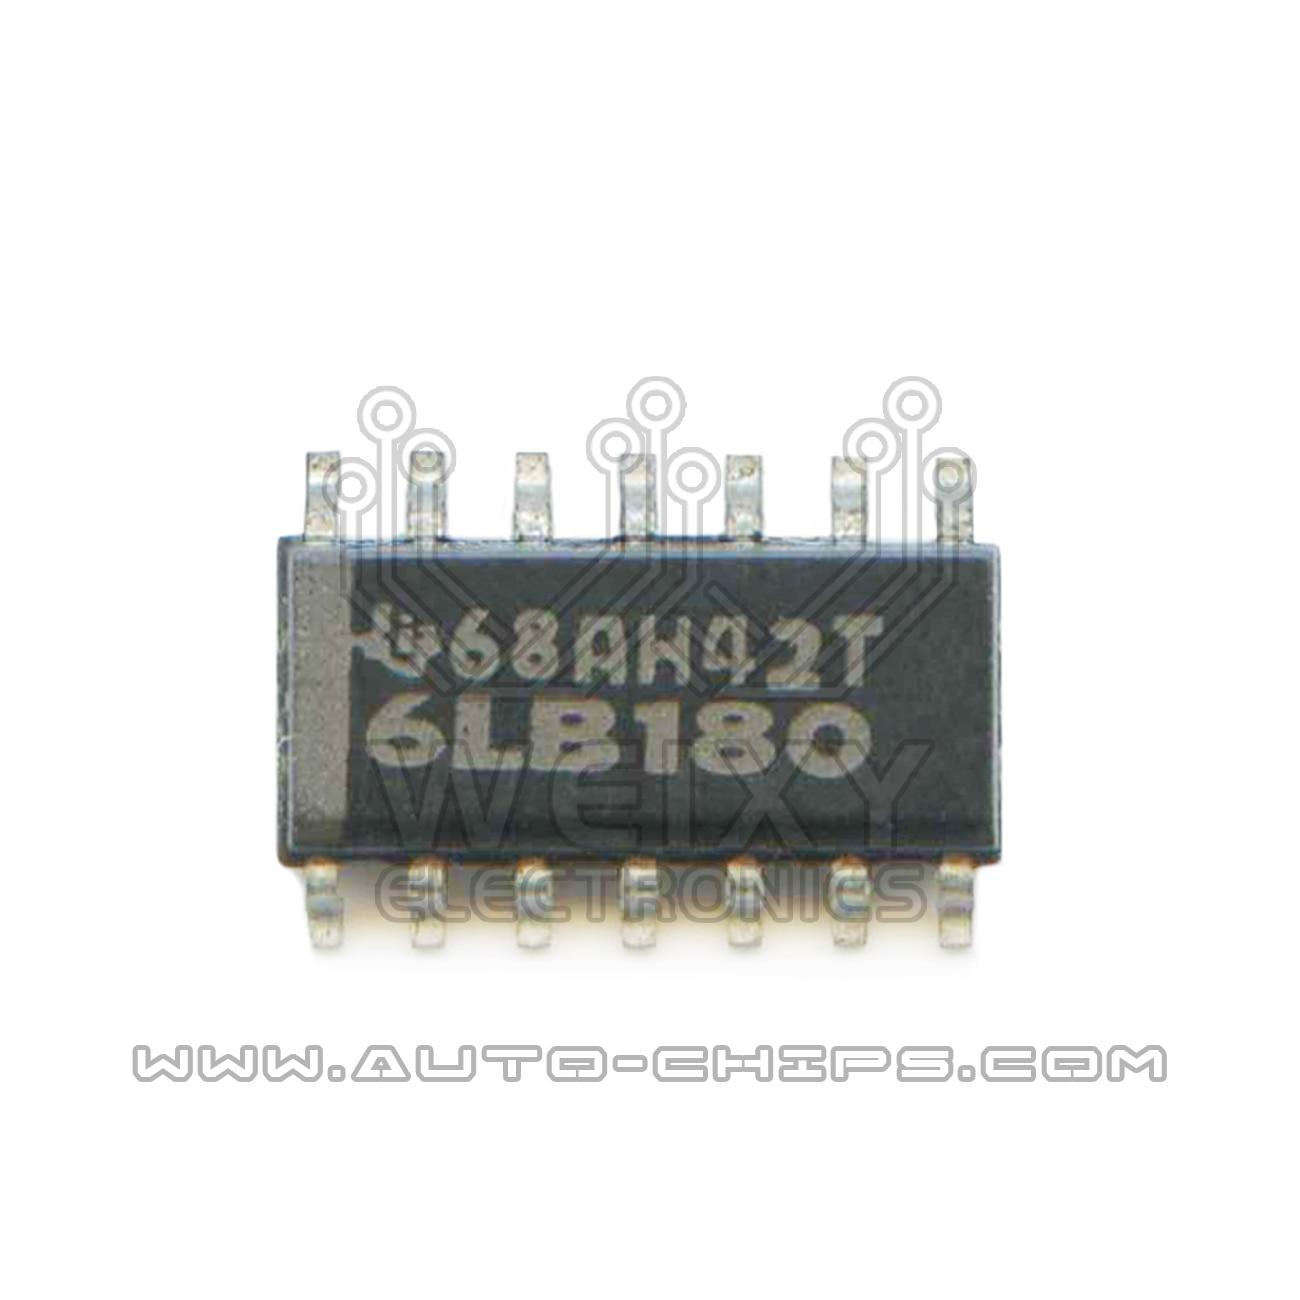 6lb180 uso da microplaqueta para automotivos